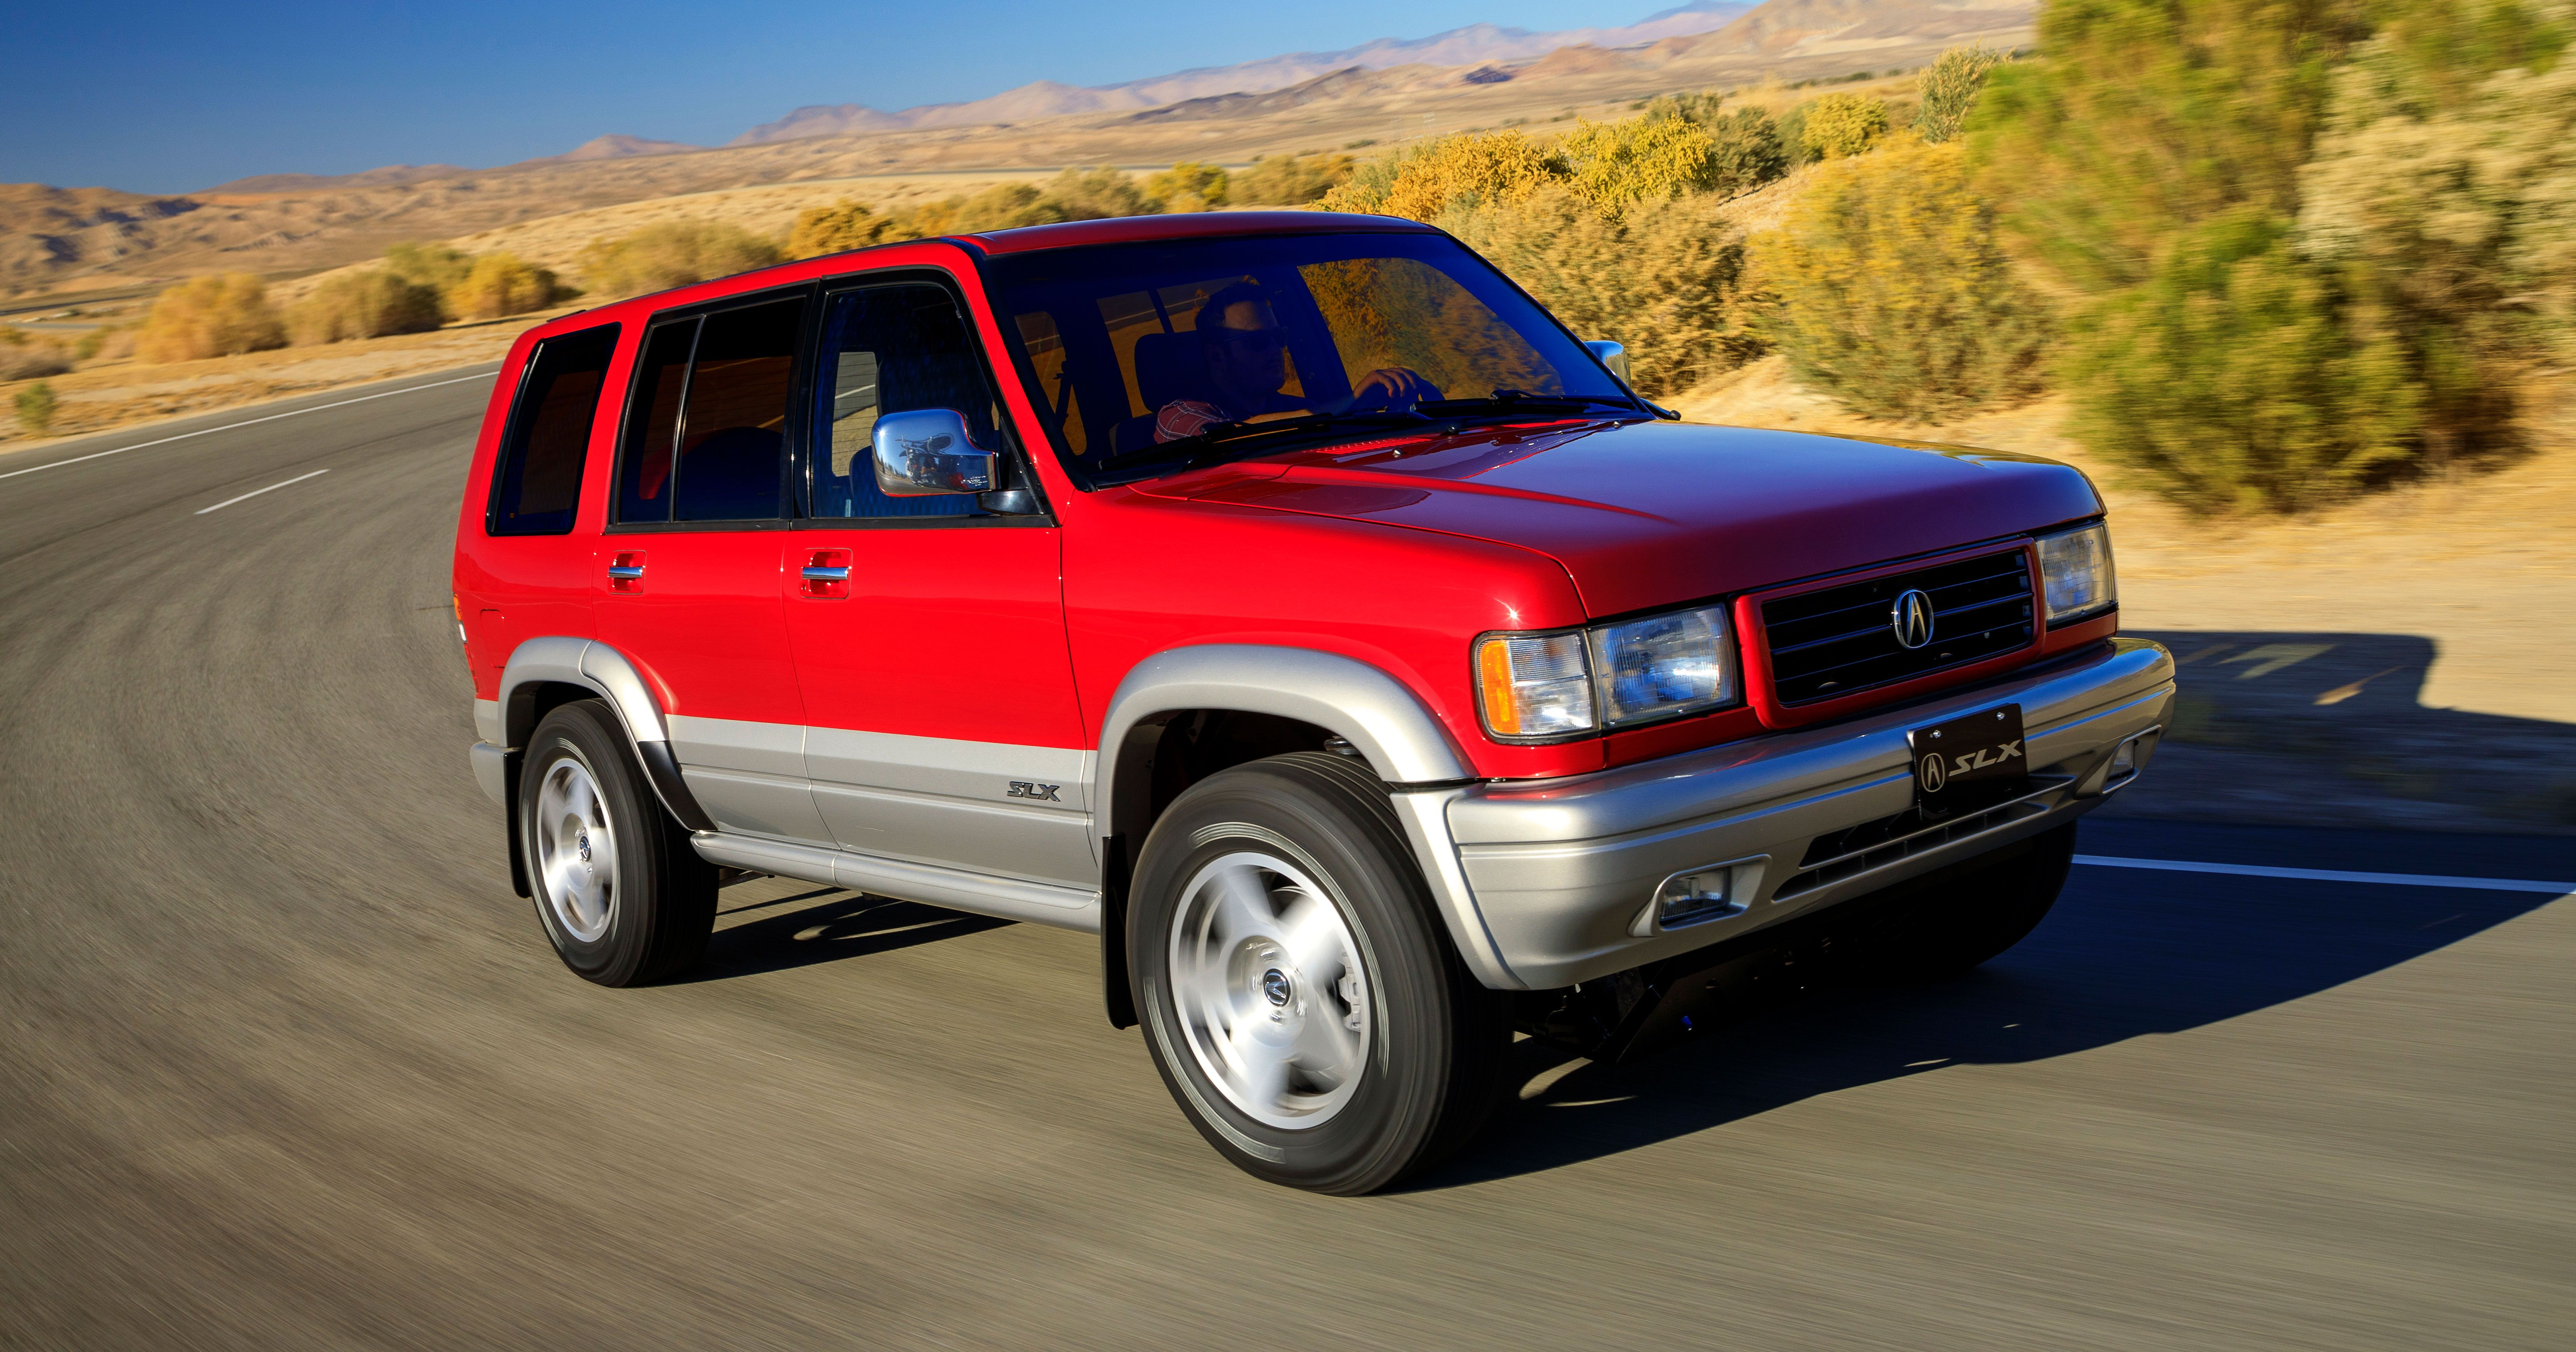 Gallery Acura S Super Handling Slx Is A Boxy 90s Suv Reborn